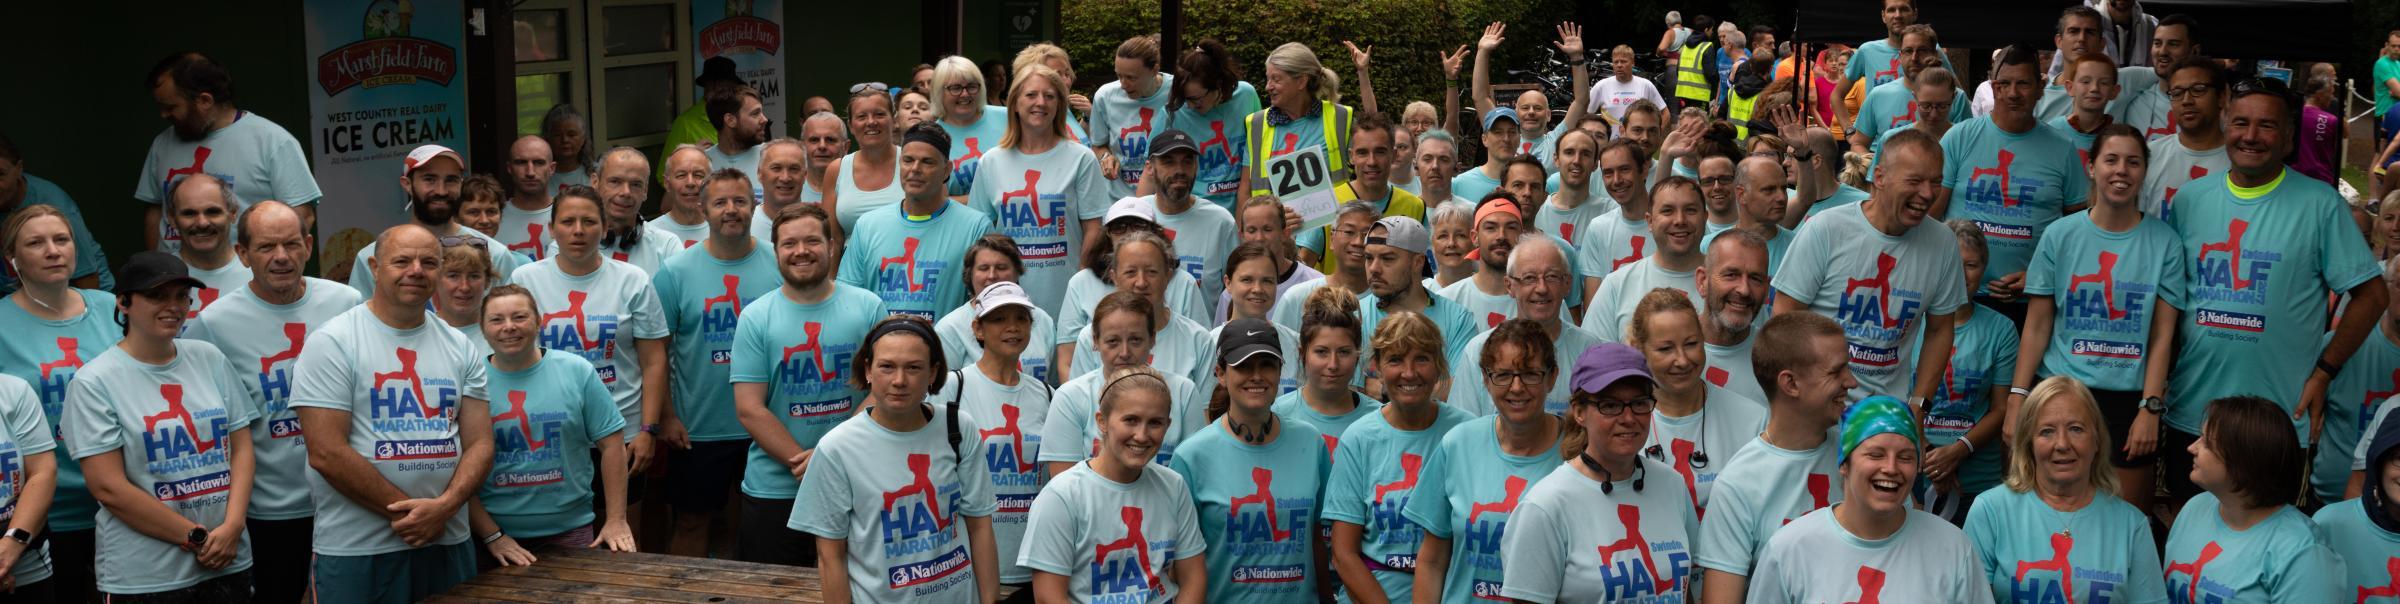 Swindon parkrun's show of support for half marathon